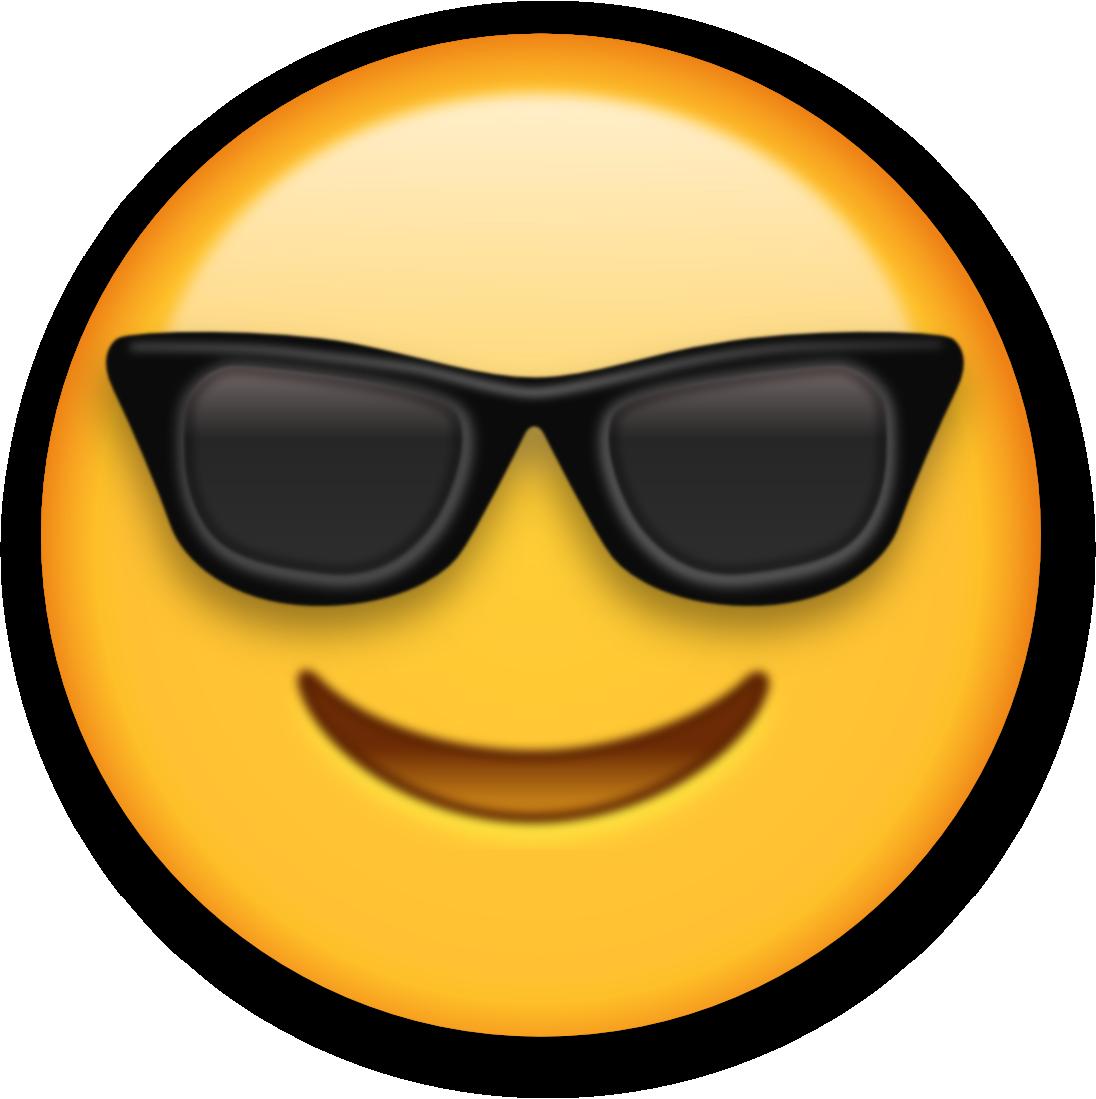 Free Free Emoji Clipart, Download Free Clip Art, Free Clip.